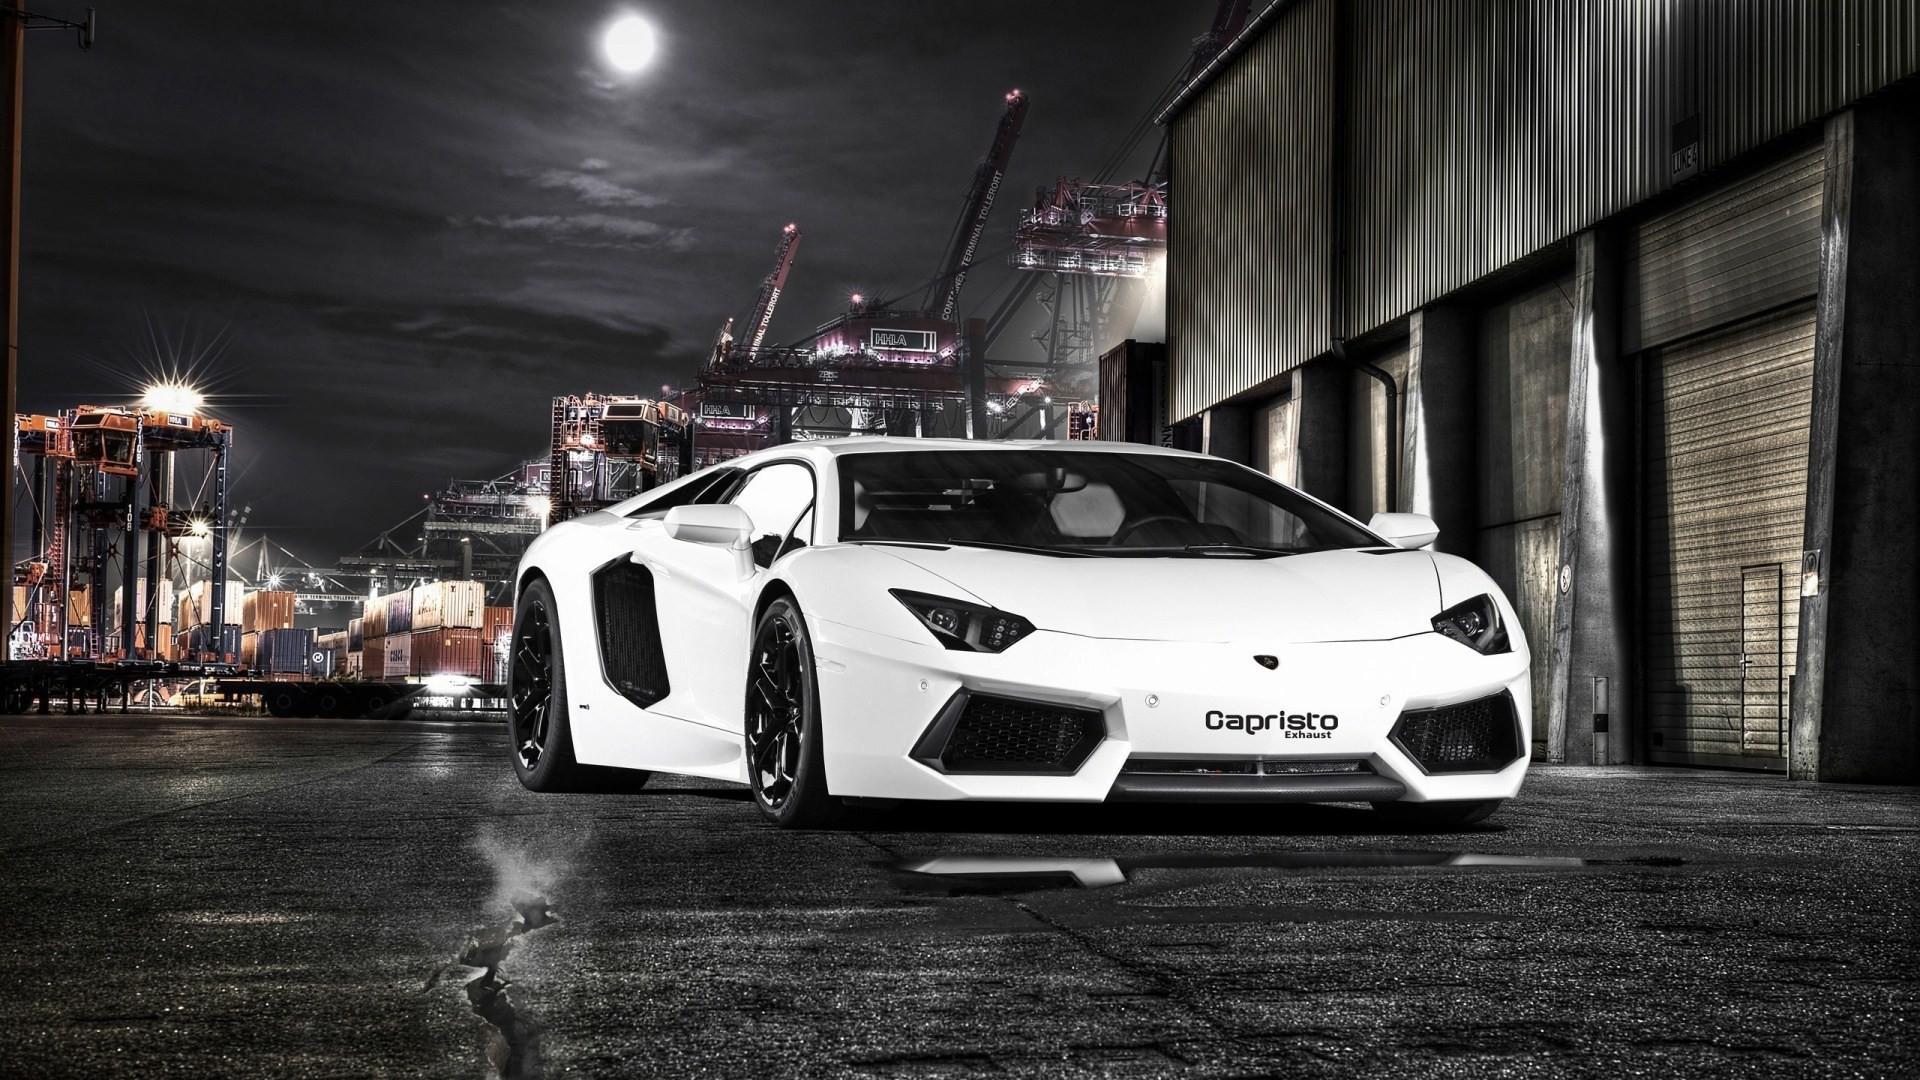 Luxury Car Wallpaper Hd Lamborghini Car Wallpapers For Pc 332809 Hd Wallpaper Backgrounds Download